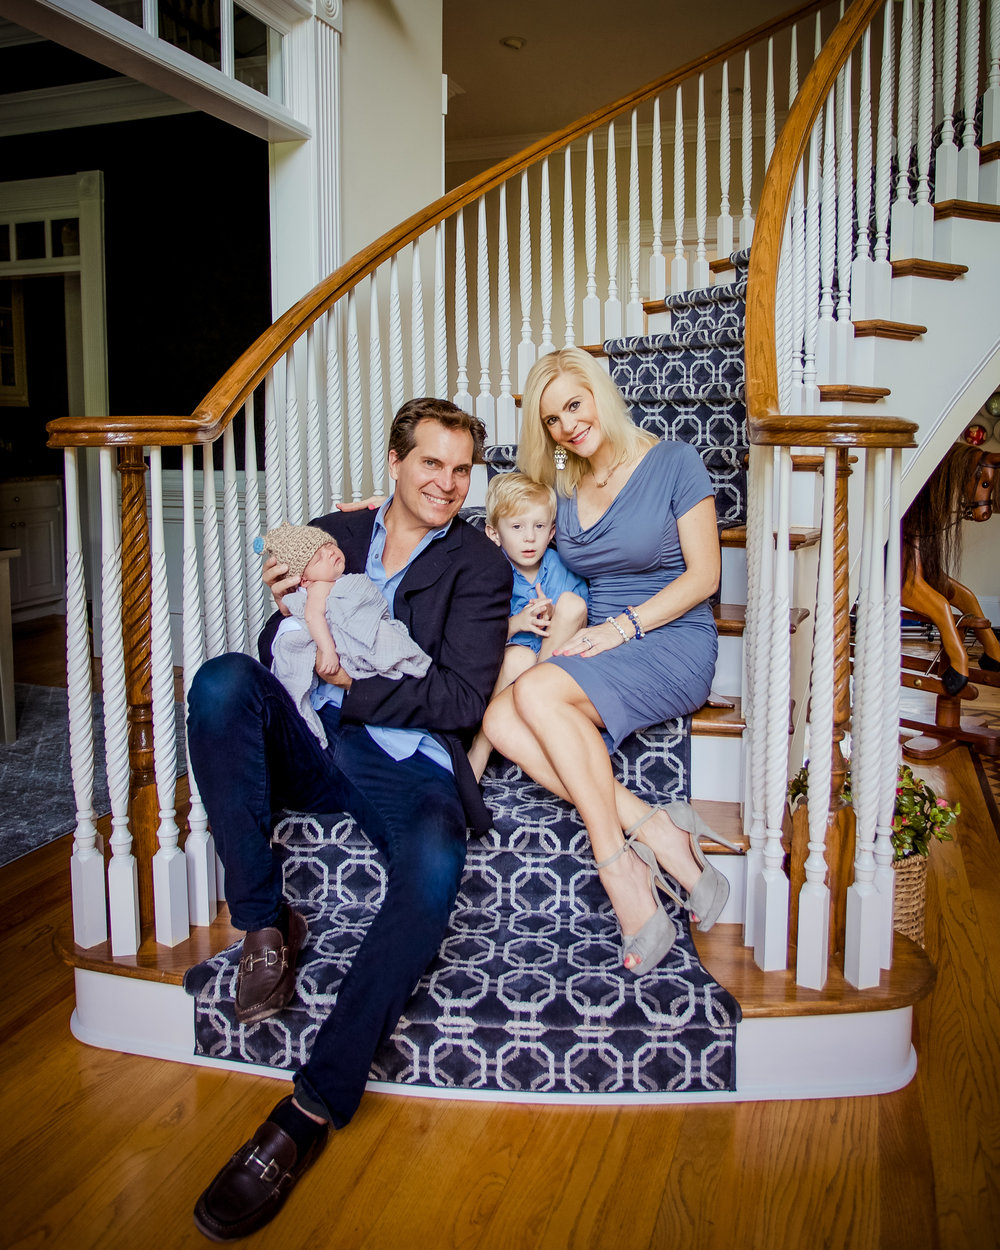 Johns Creek, GA Family portrait photographer